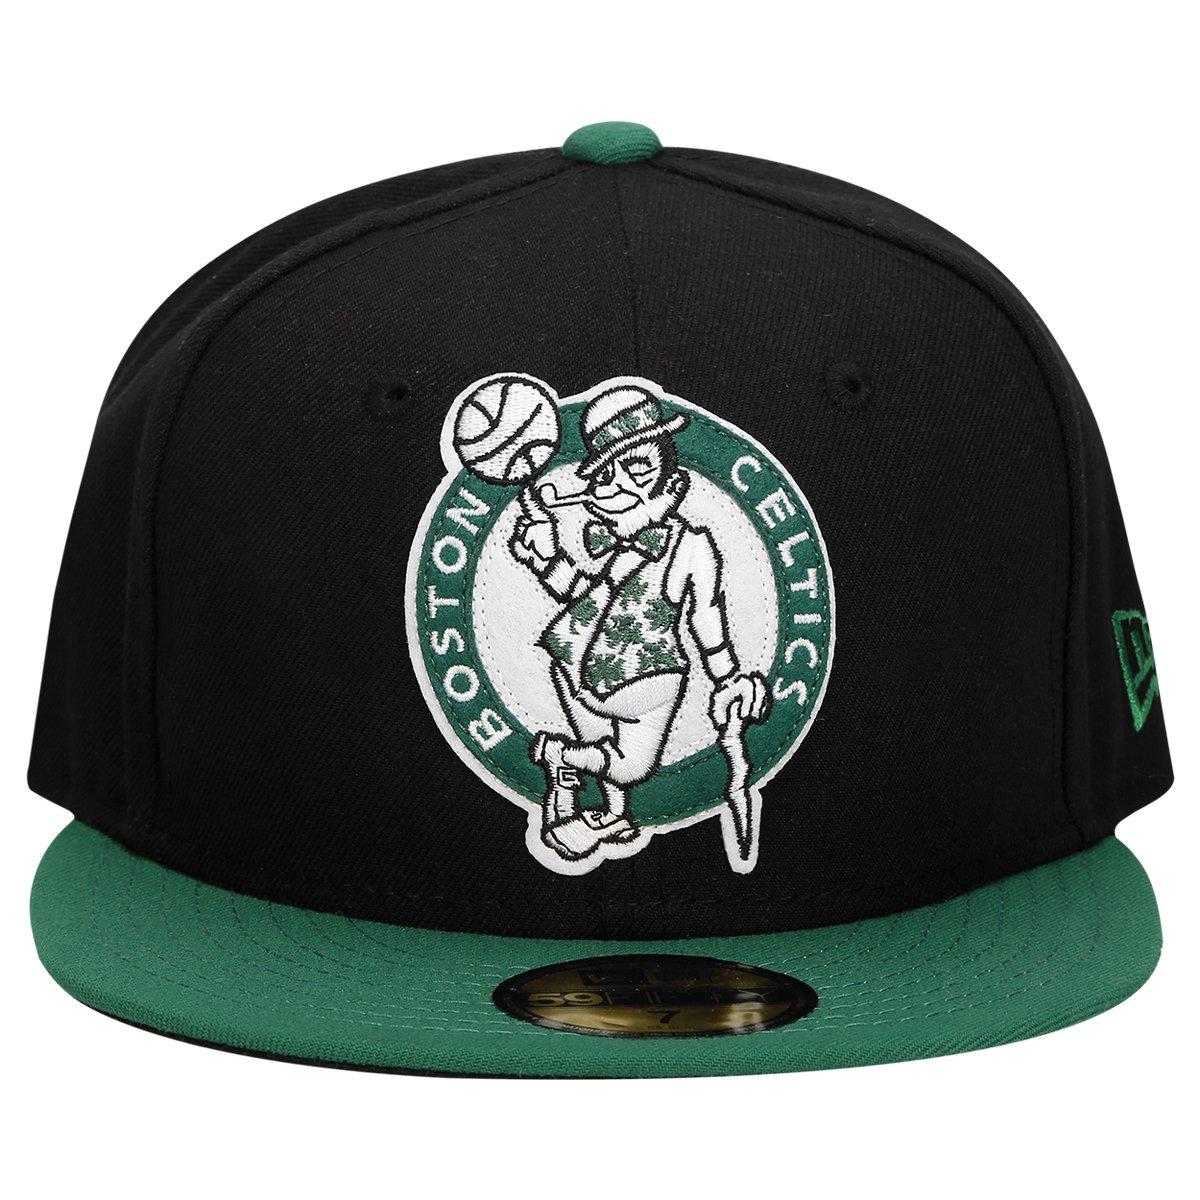 Boné New Era NBA 5950 Os Felt Boston Celtics - Compre Agora  32430dbb9dc